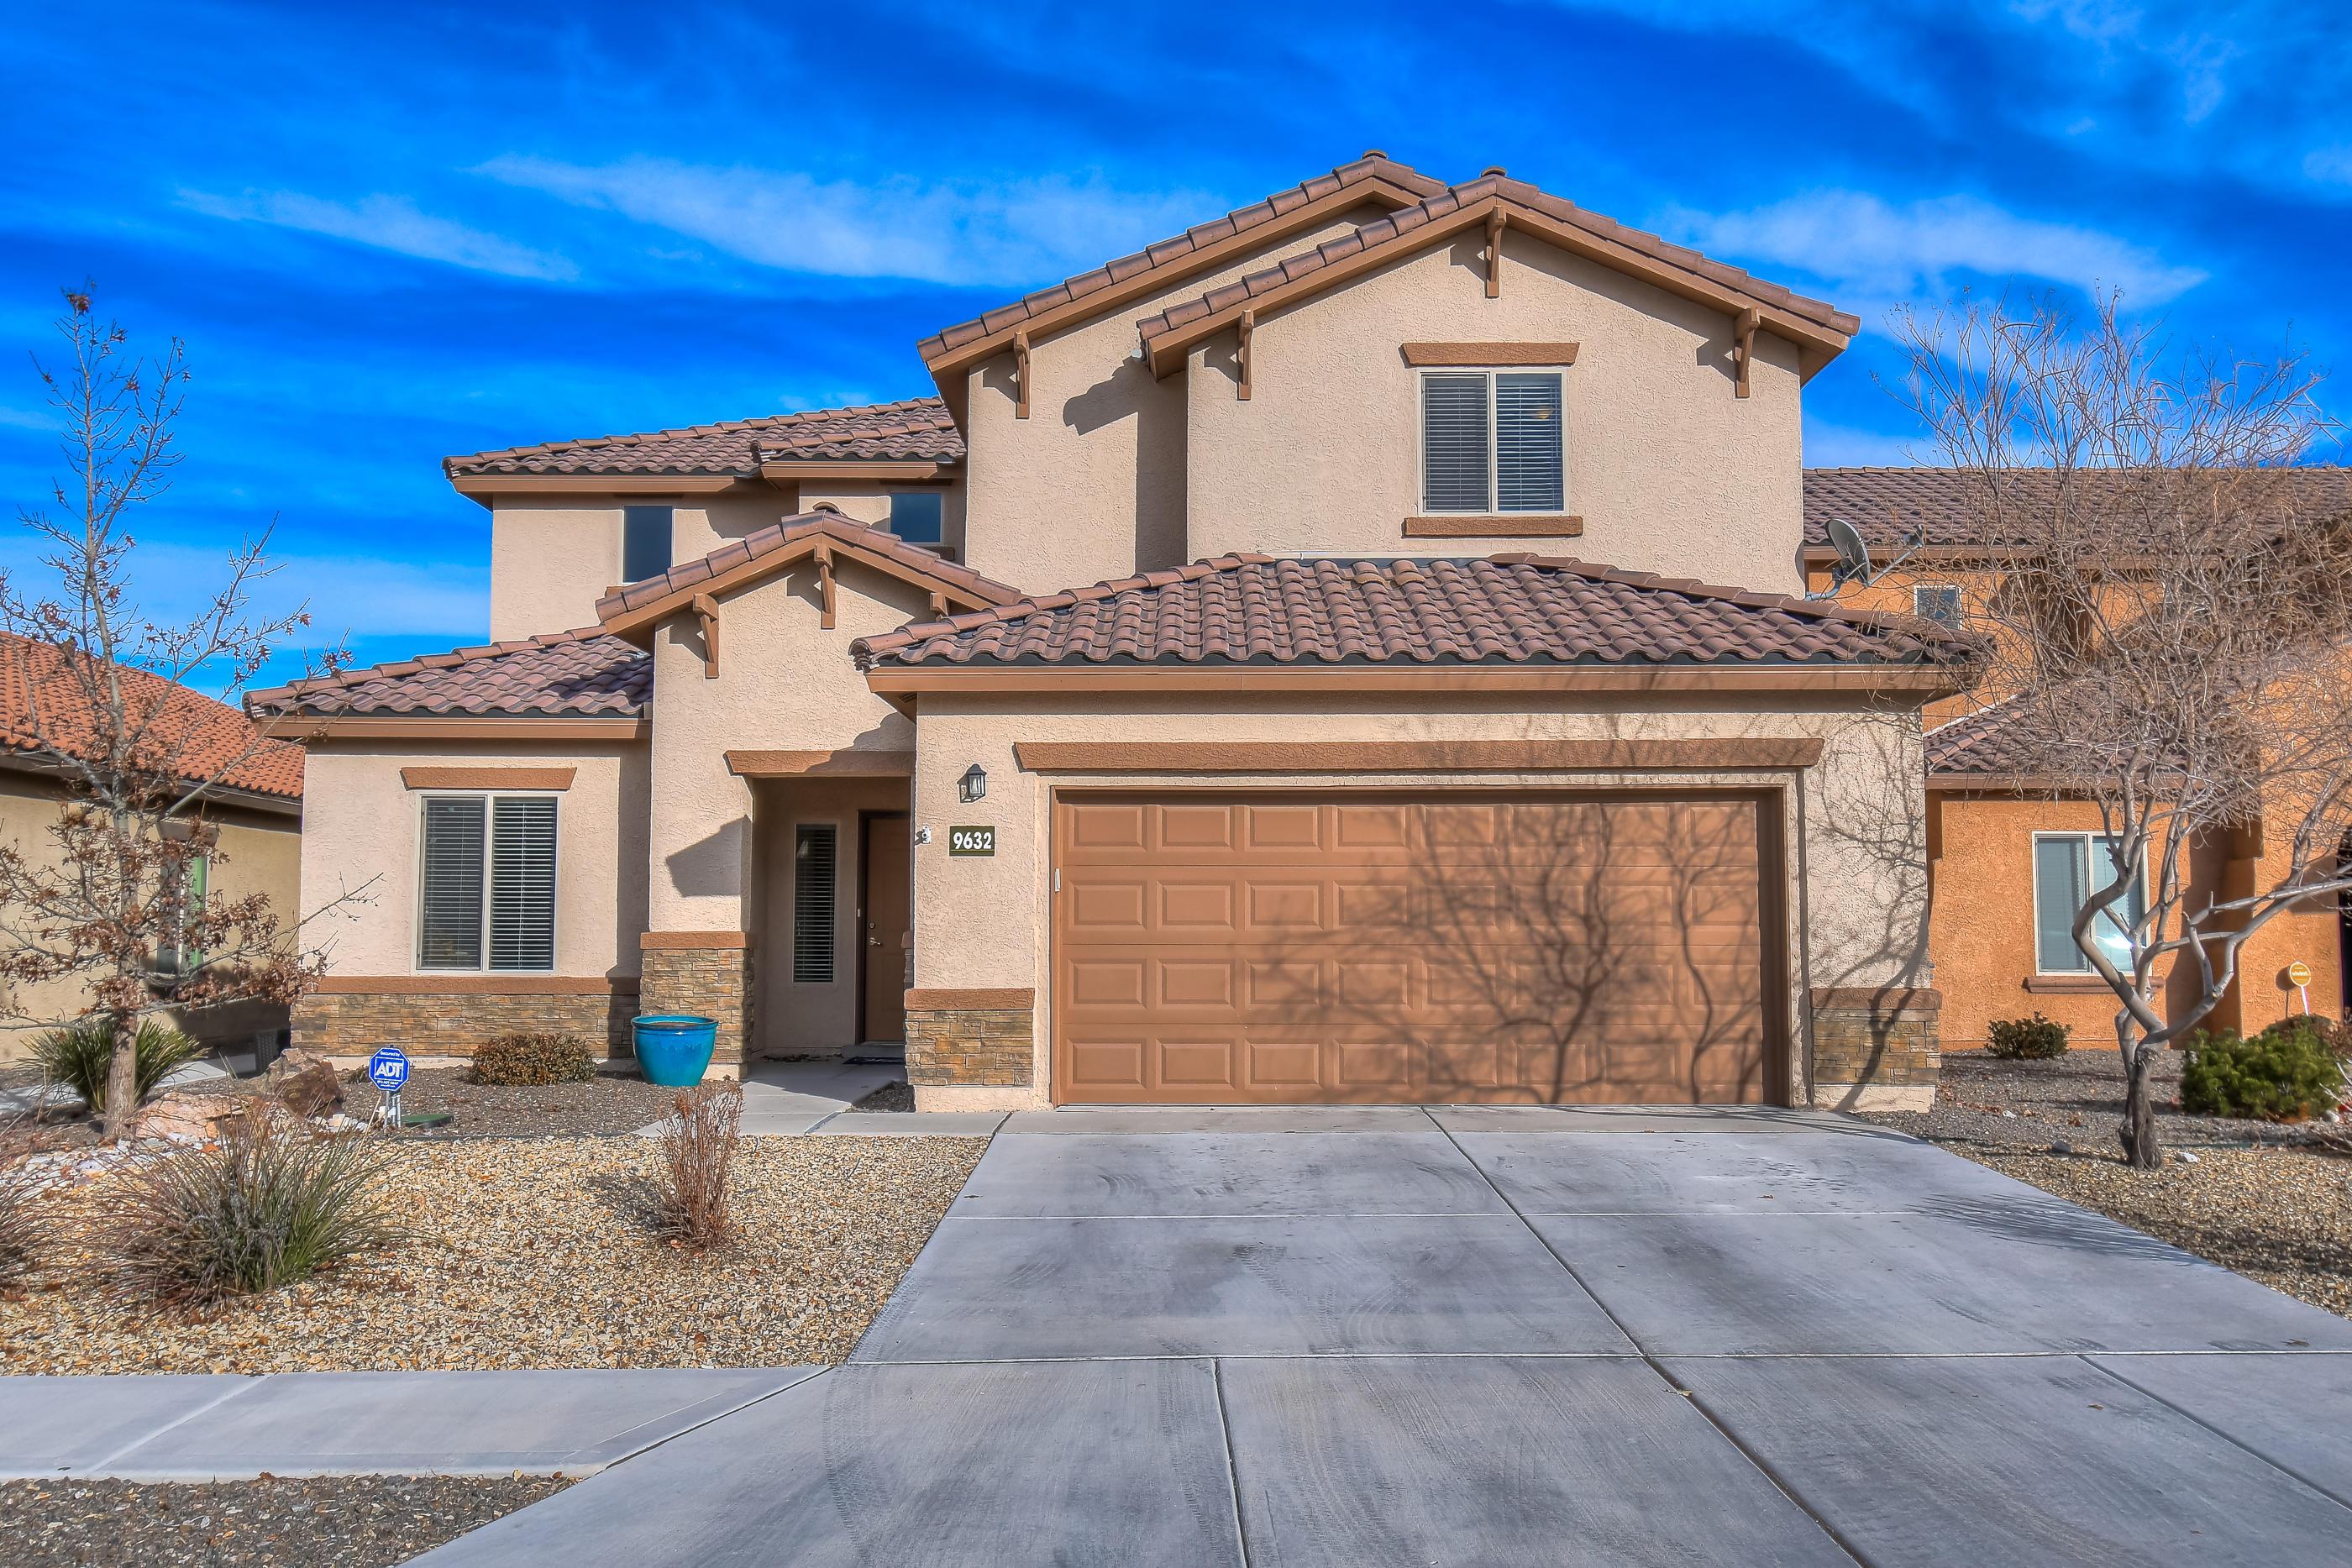 9632 NW Slickrock Court, Northwest Albuquerque and Northwest Heights, New Mexico